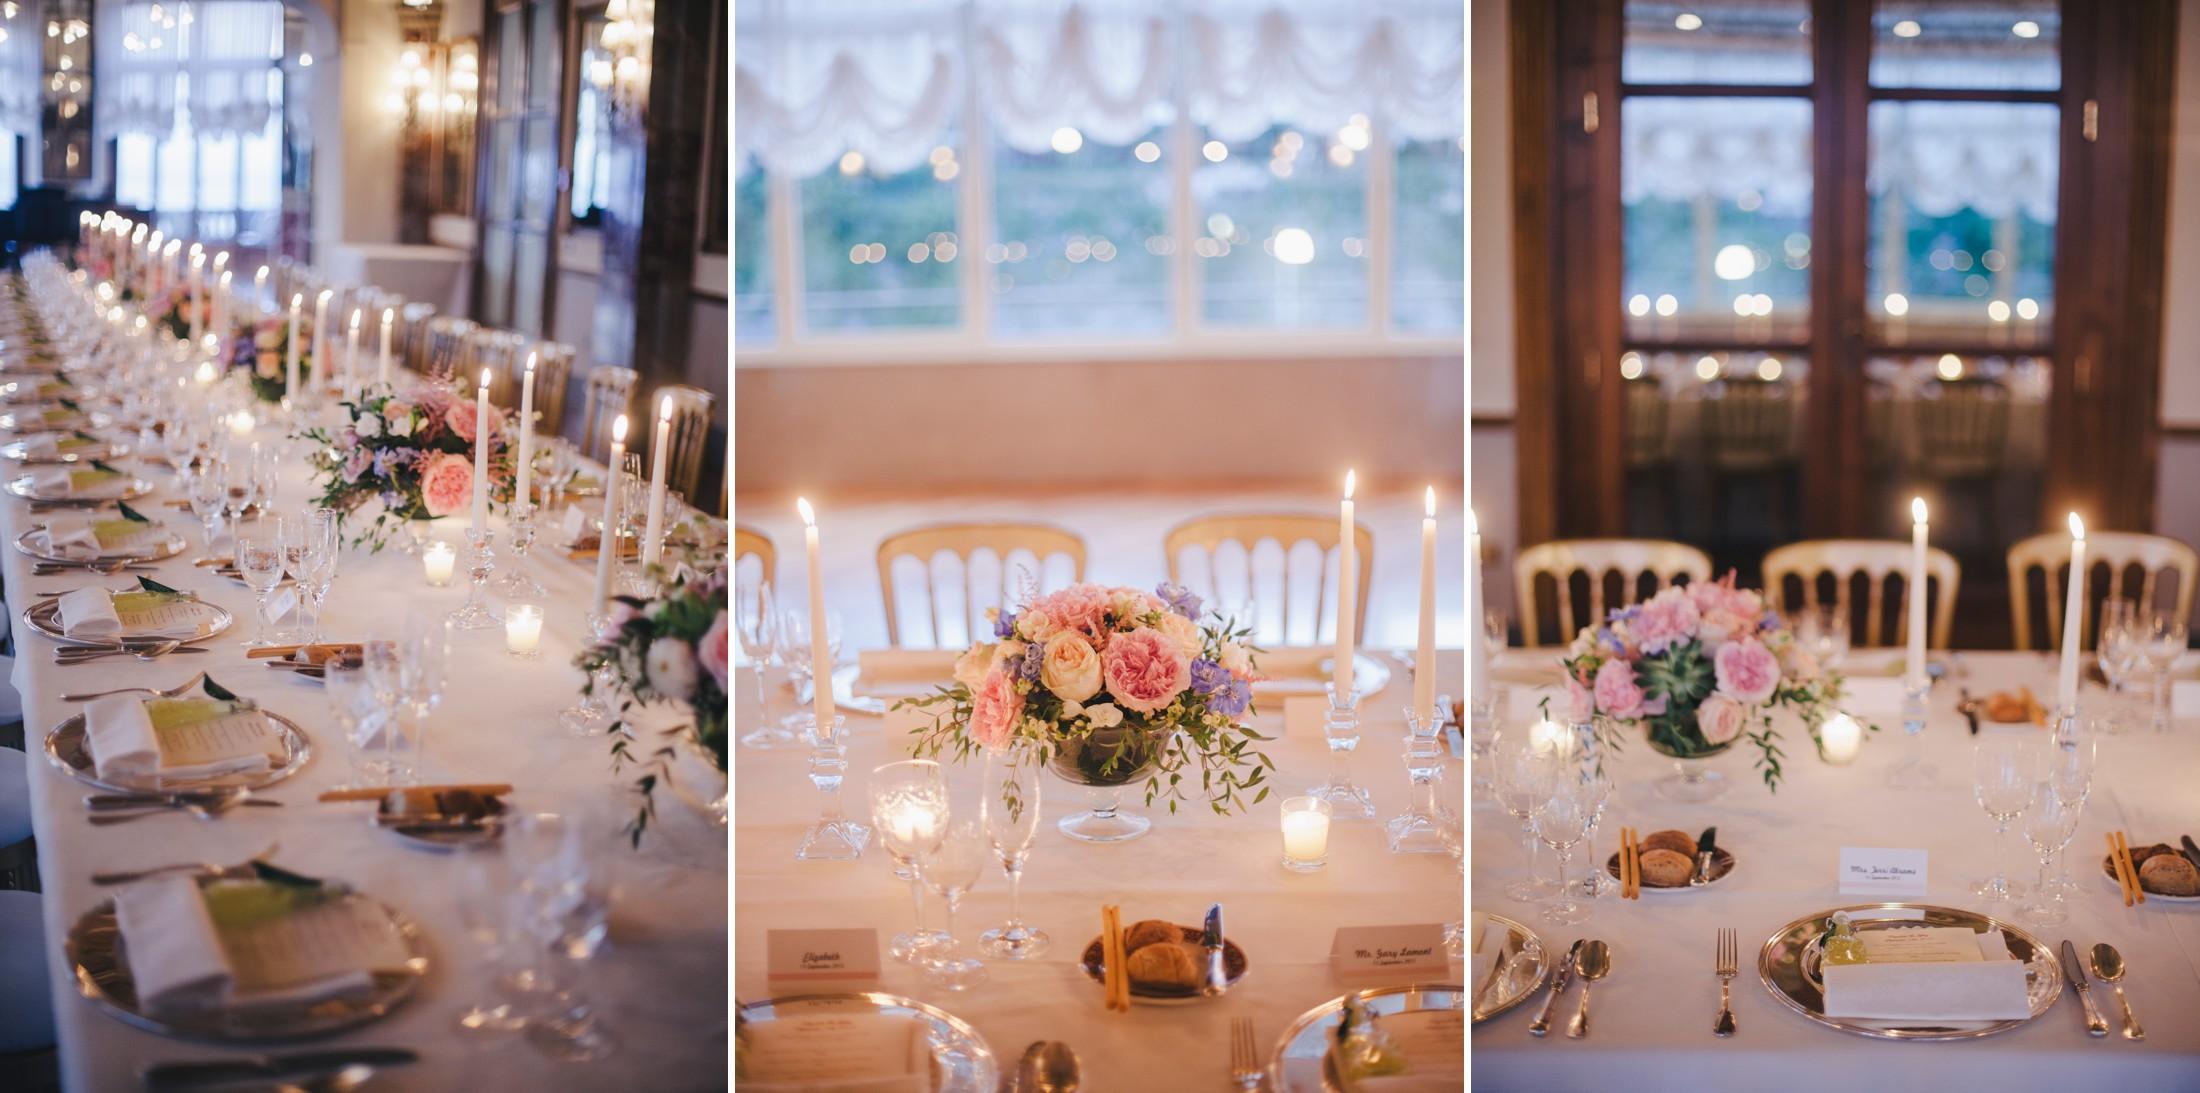 wedding in sorrento collage wedding table decor